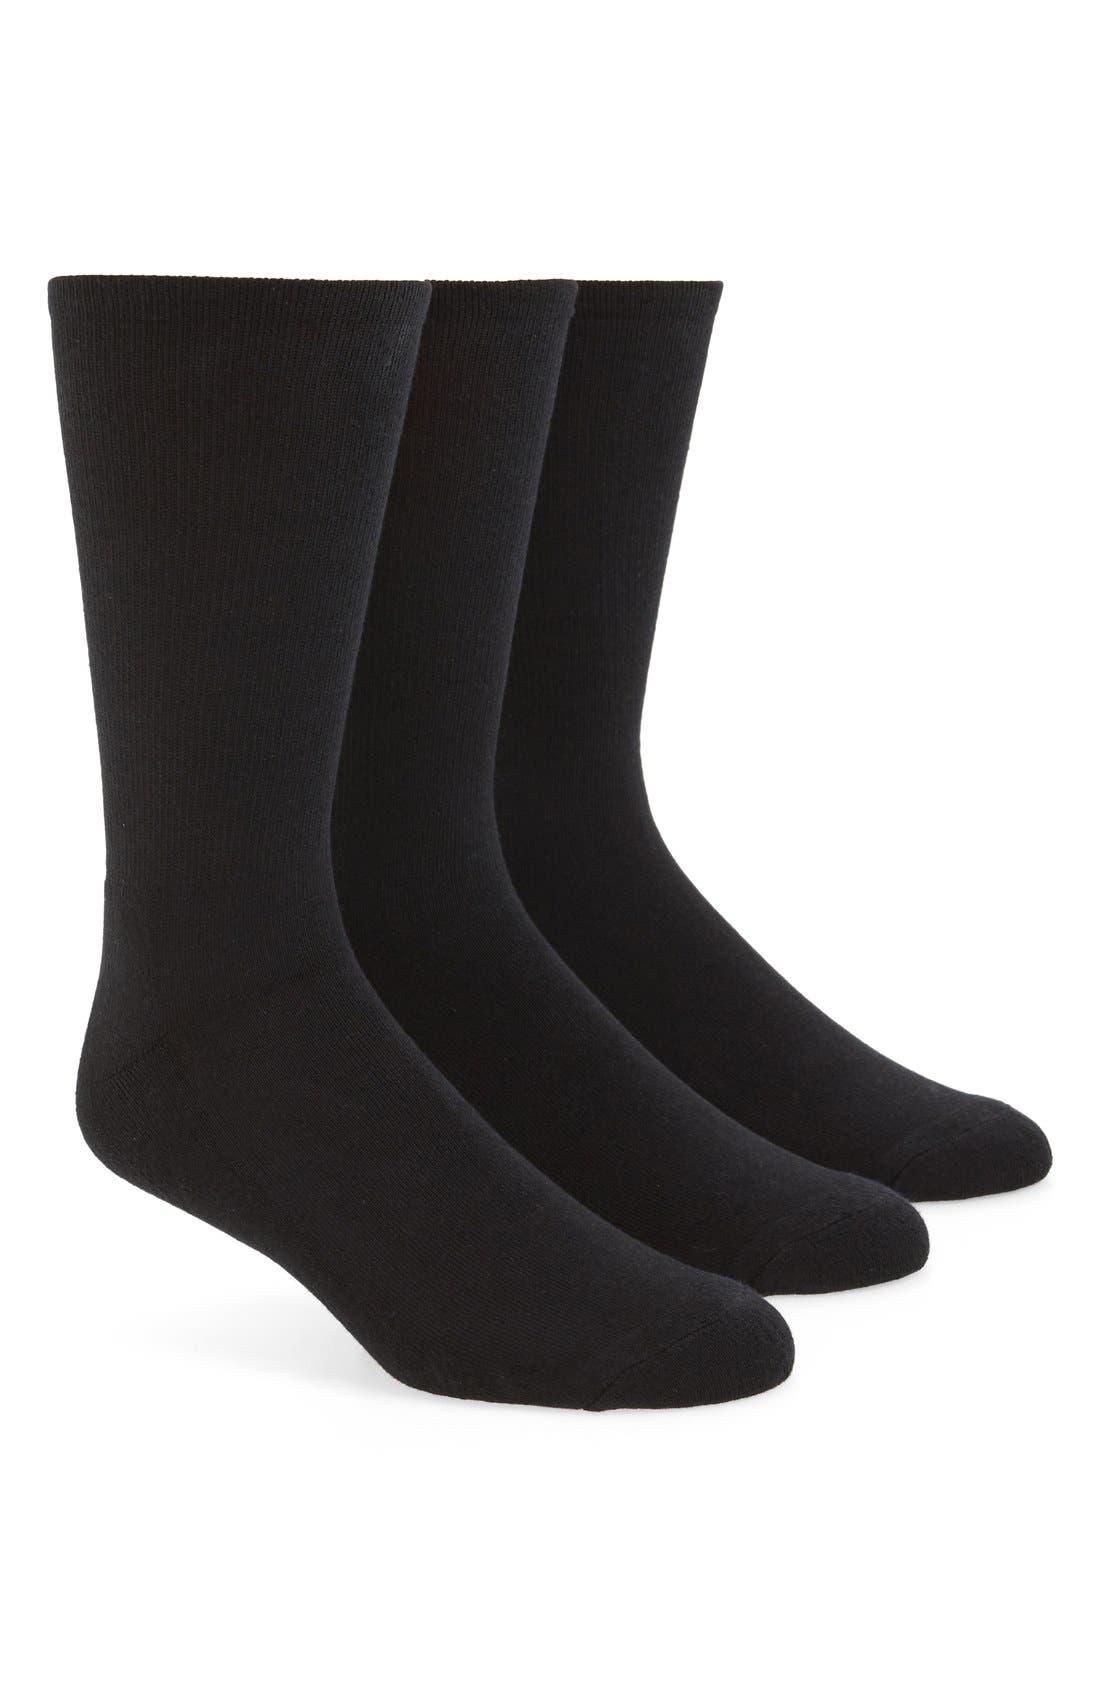 3-Pack Cotton Blend Socks,                             Main thumbnail 1, color,                             001